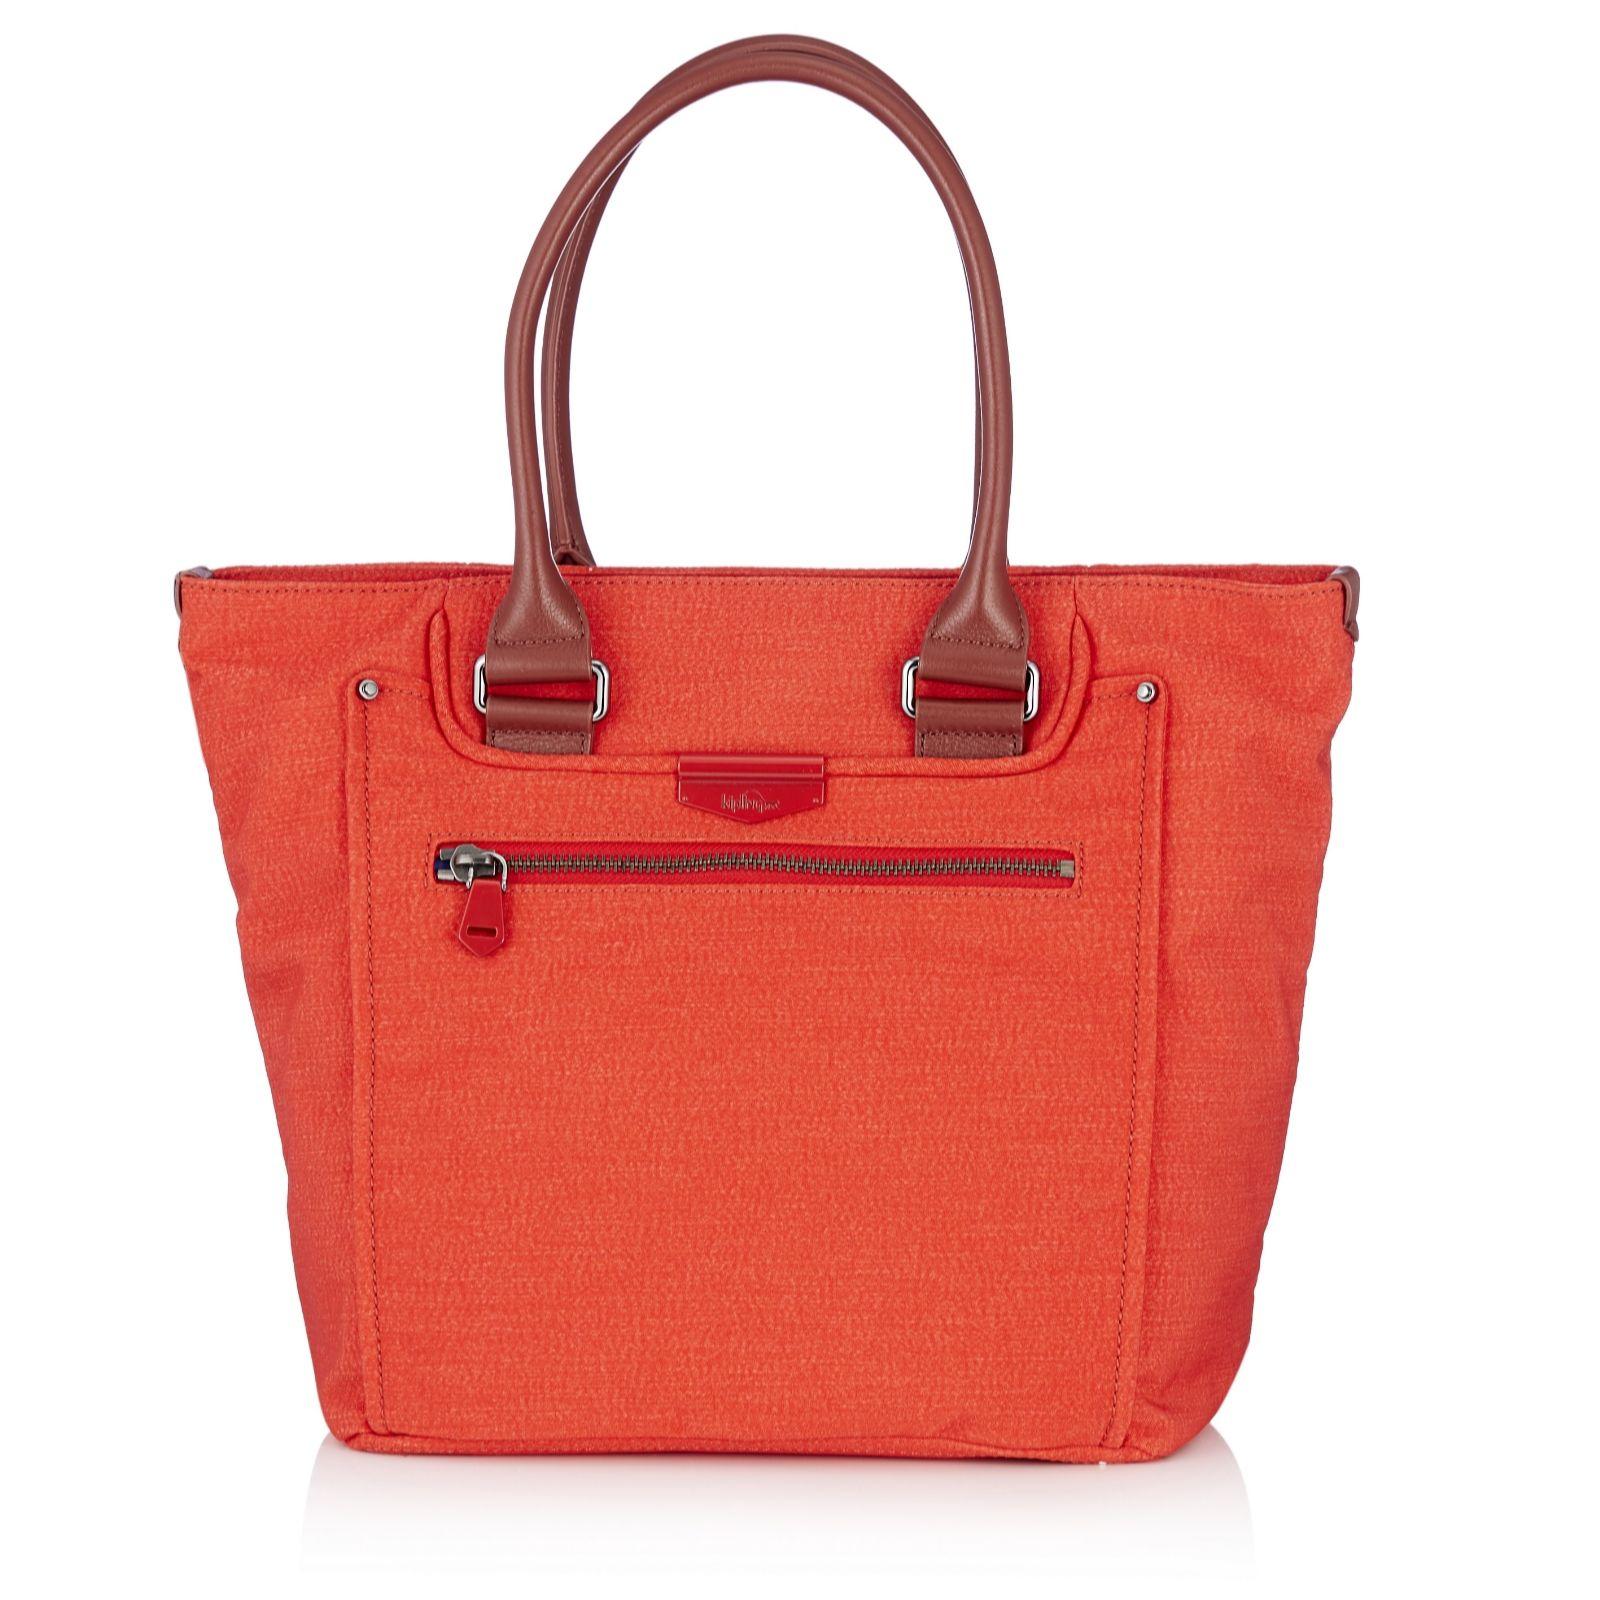 Shopper & Tote — Handbags — Shoes & Handbags - QVC UK